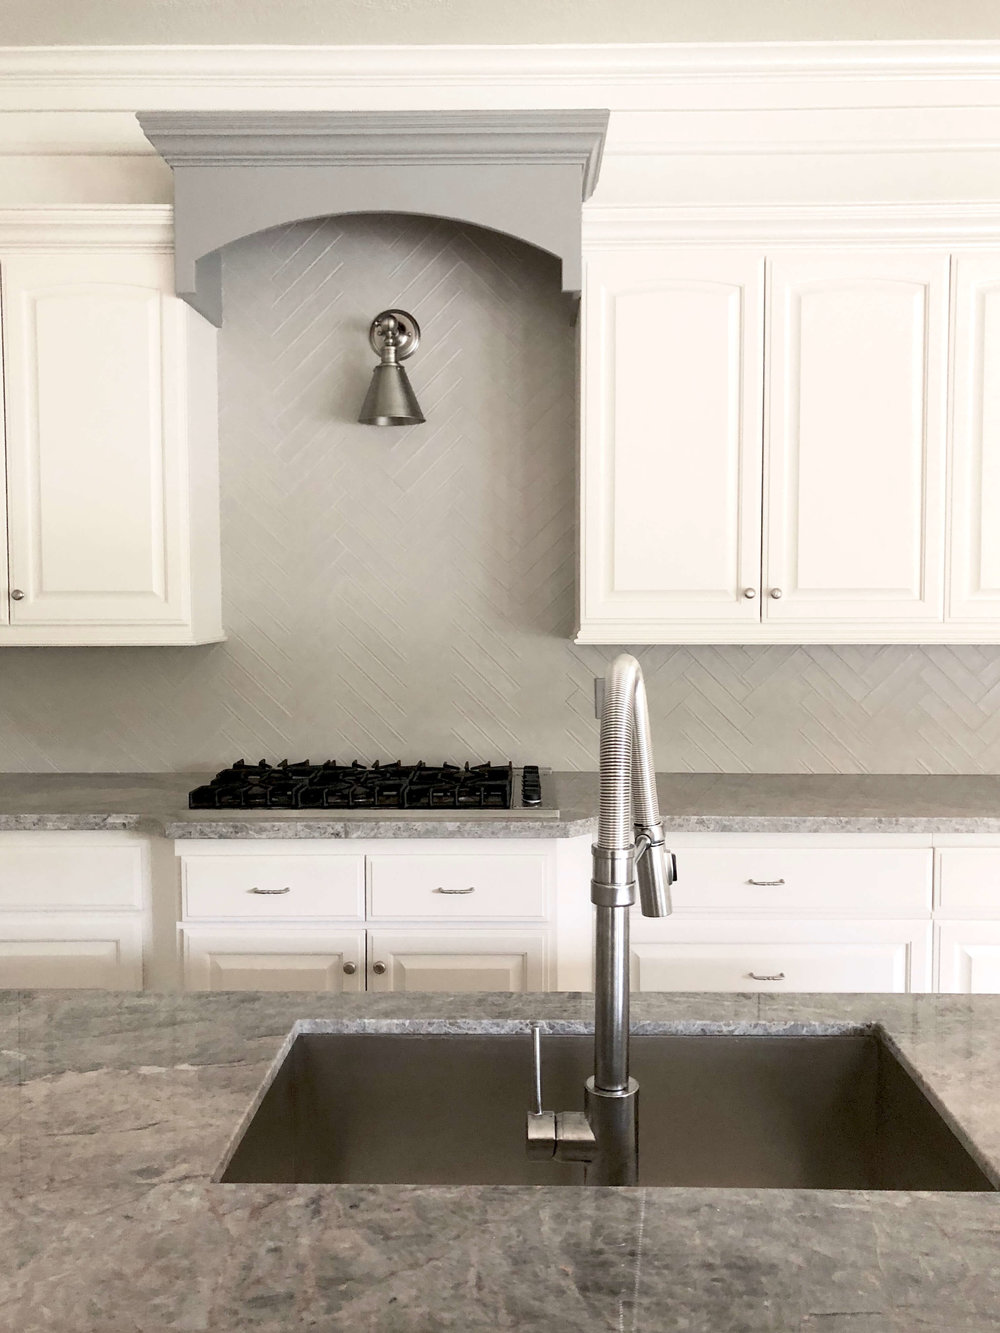 AFTER KITCHEN REMODEL - New countertops, backsplash, paint, cabinet pulls, lighting, sink, faucet | Carla Aston, Designer #remodelingideas #remodel #kitchenremodel #grayandwhitekitchen #herringbonebacksplash